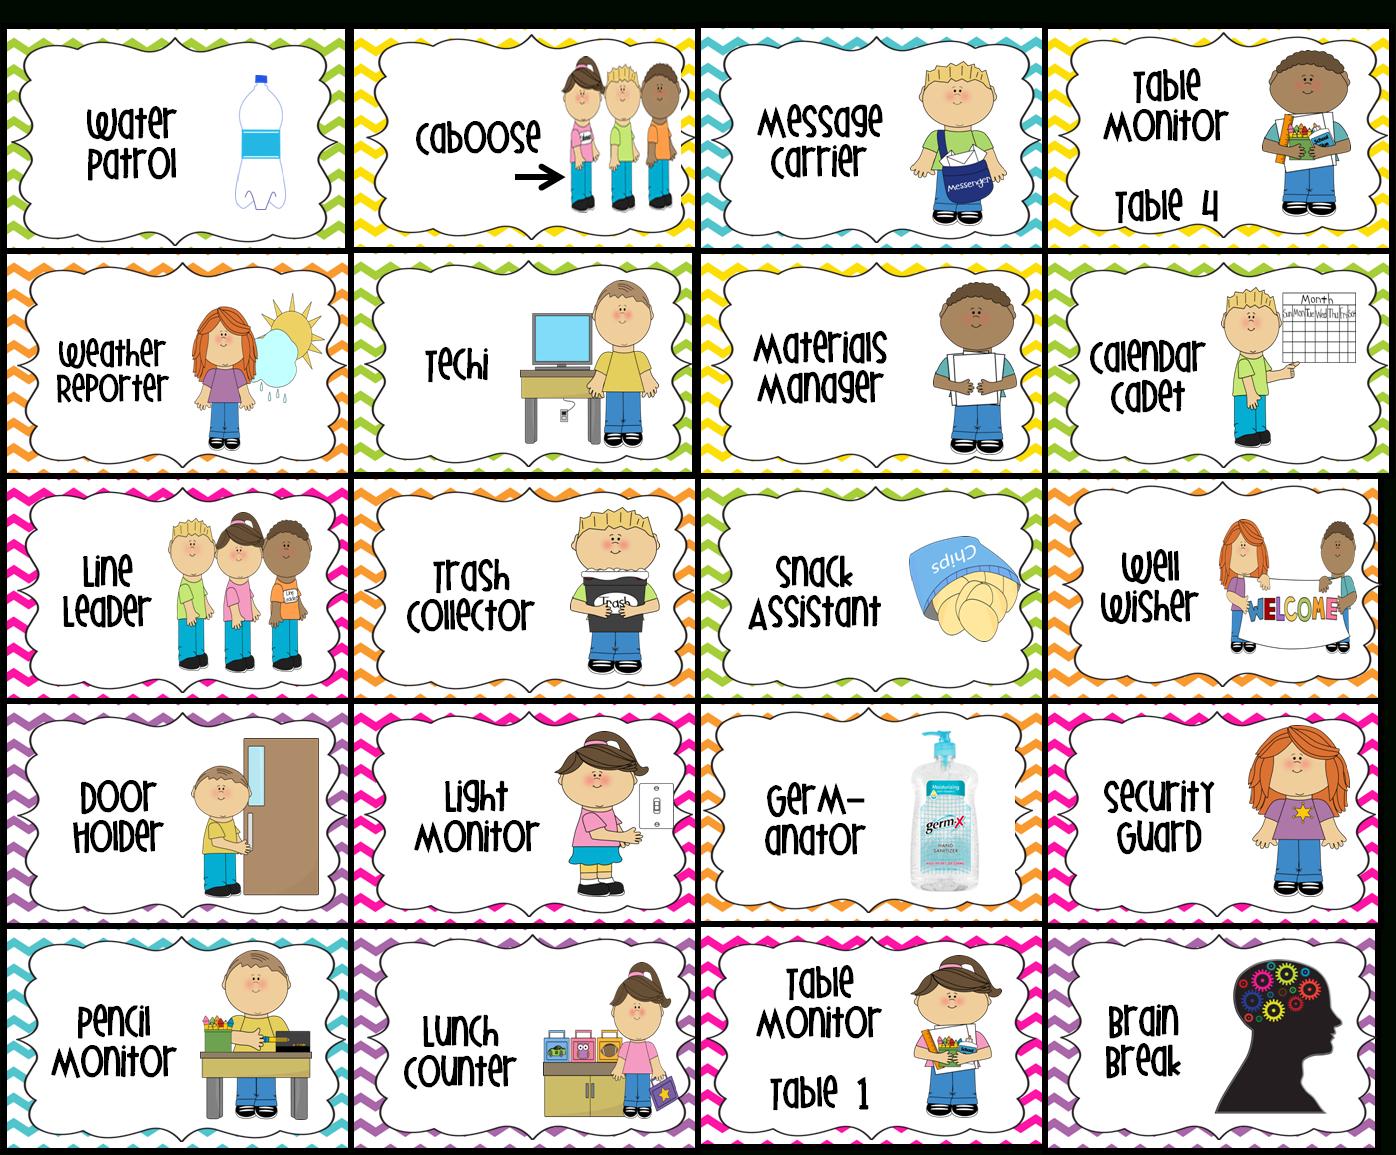 Classroom Jobs Printable | Water Patrol (2), Caboose, Message - Preschool Classroom Helper Labels Free Printable